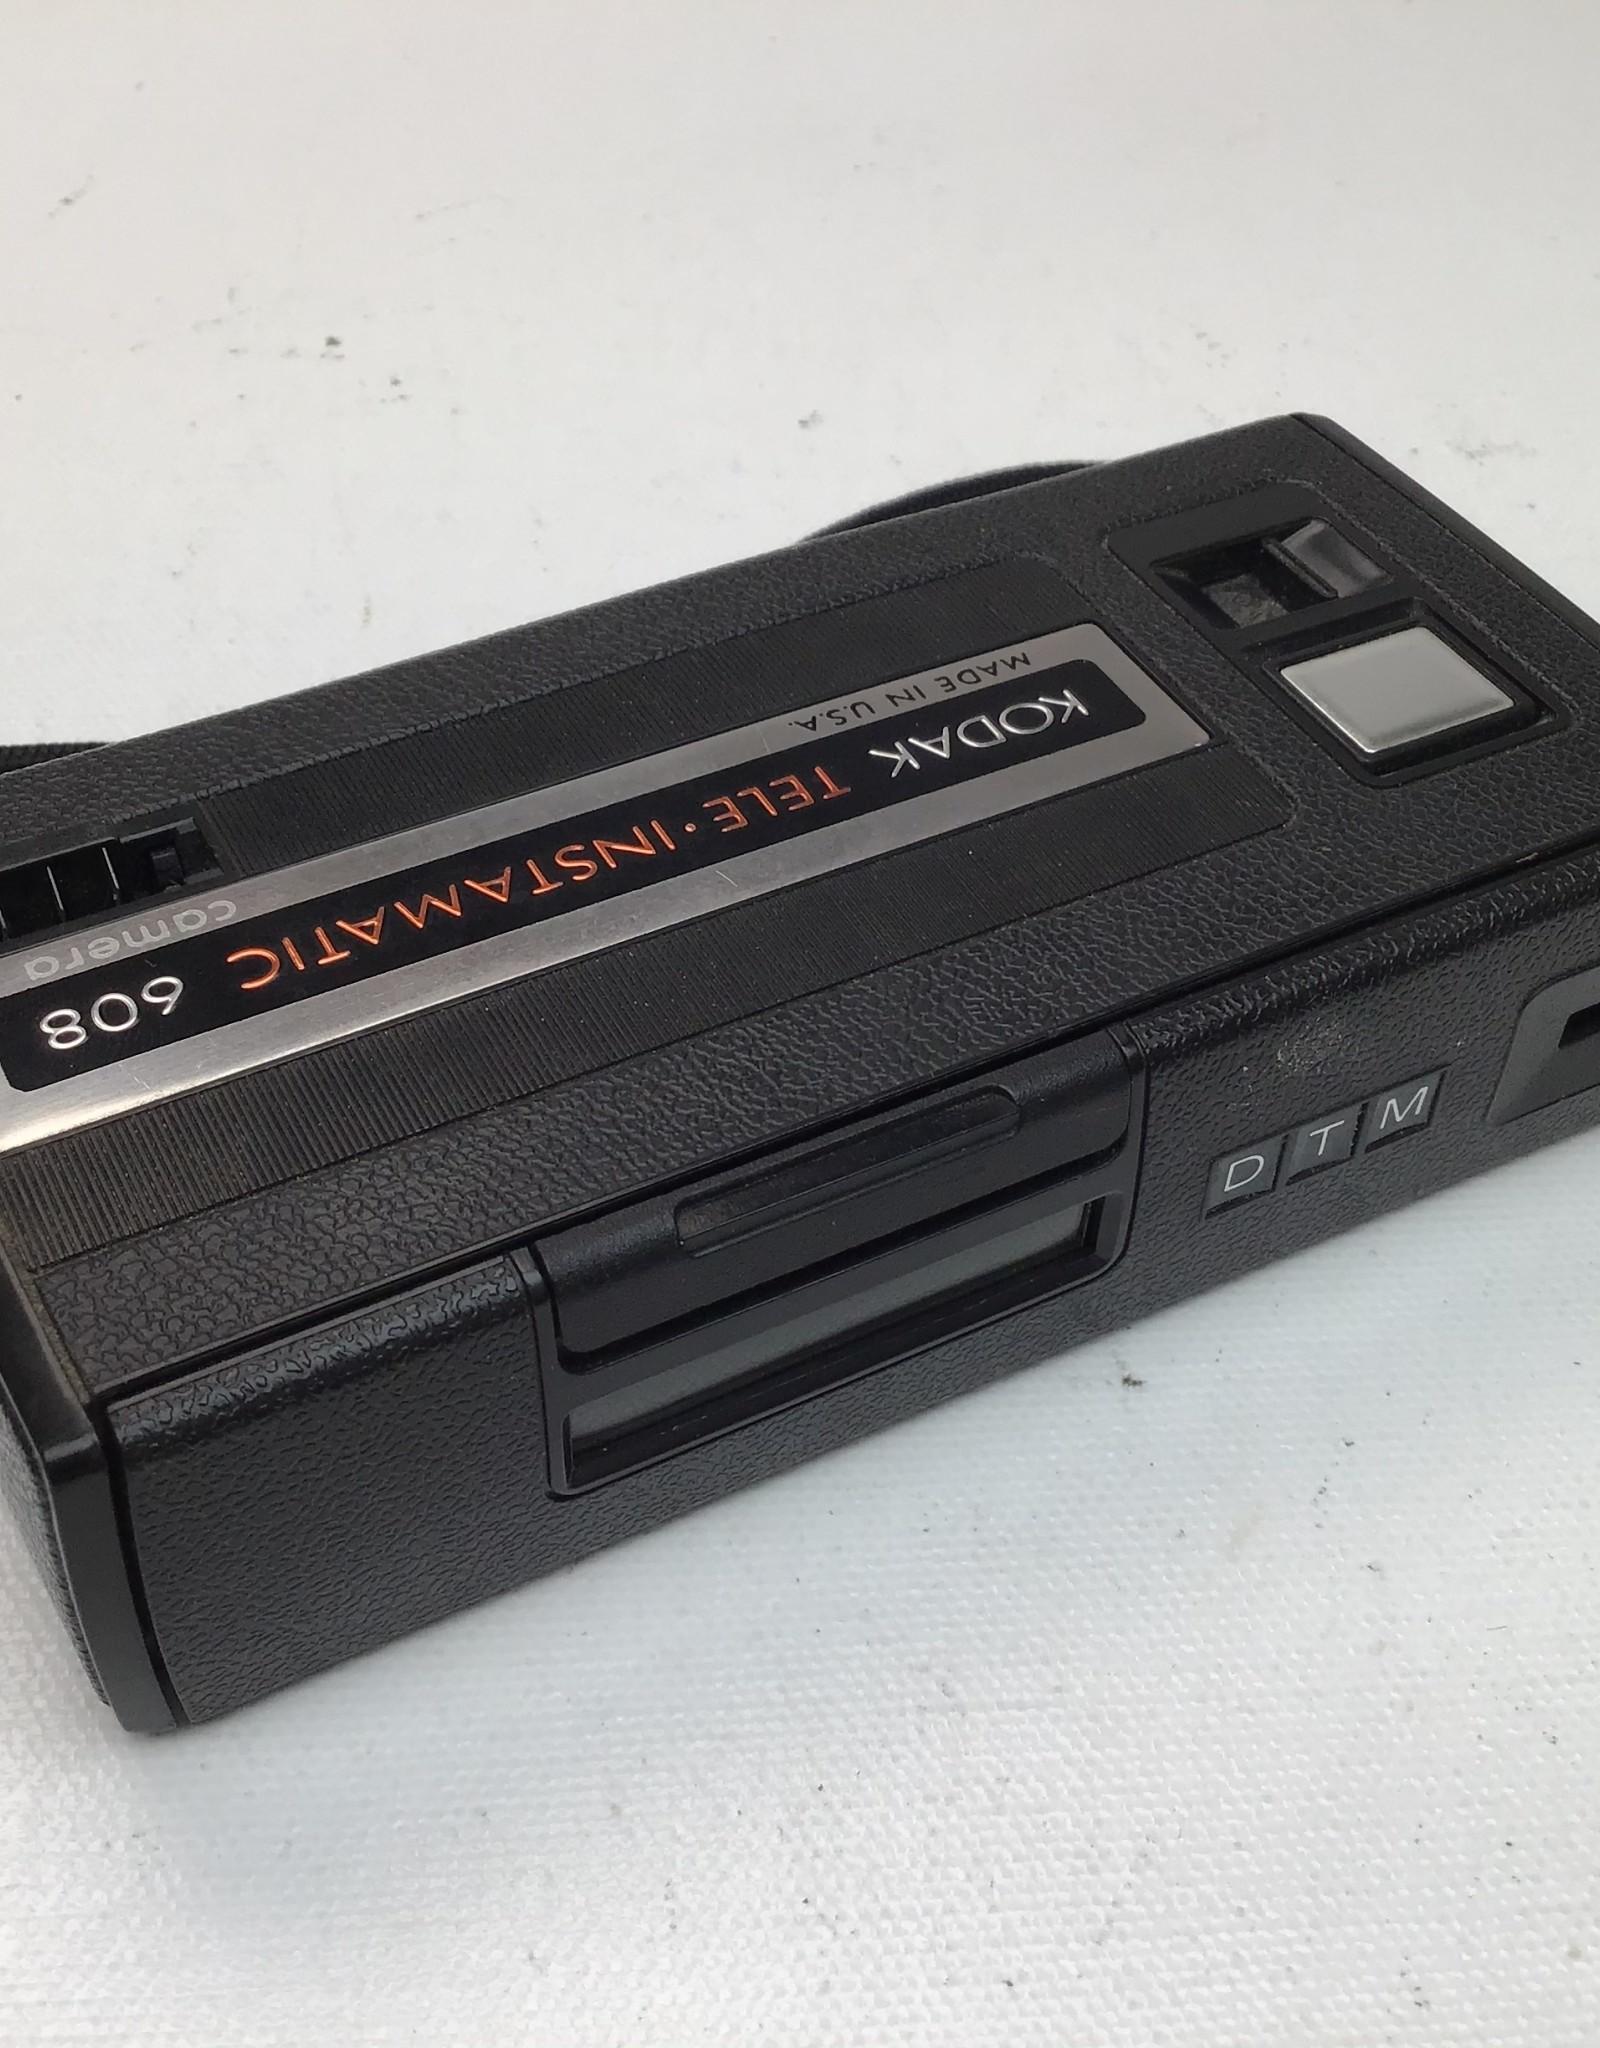 Kodak Tele-Instamatic 608 110 Film Camera Used AsIs